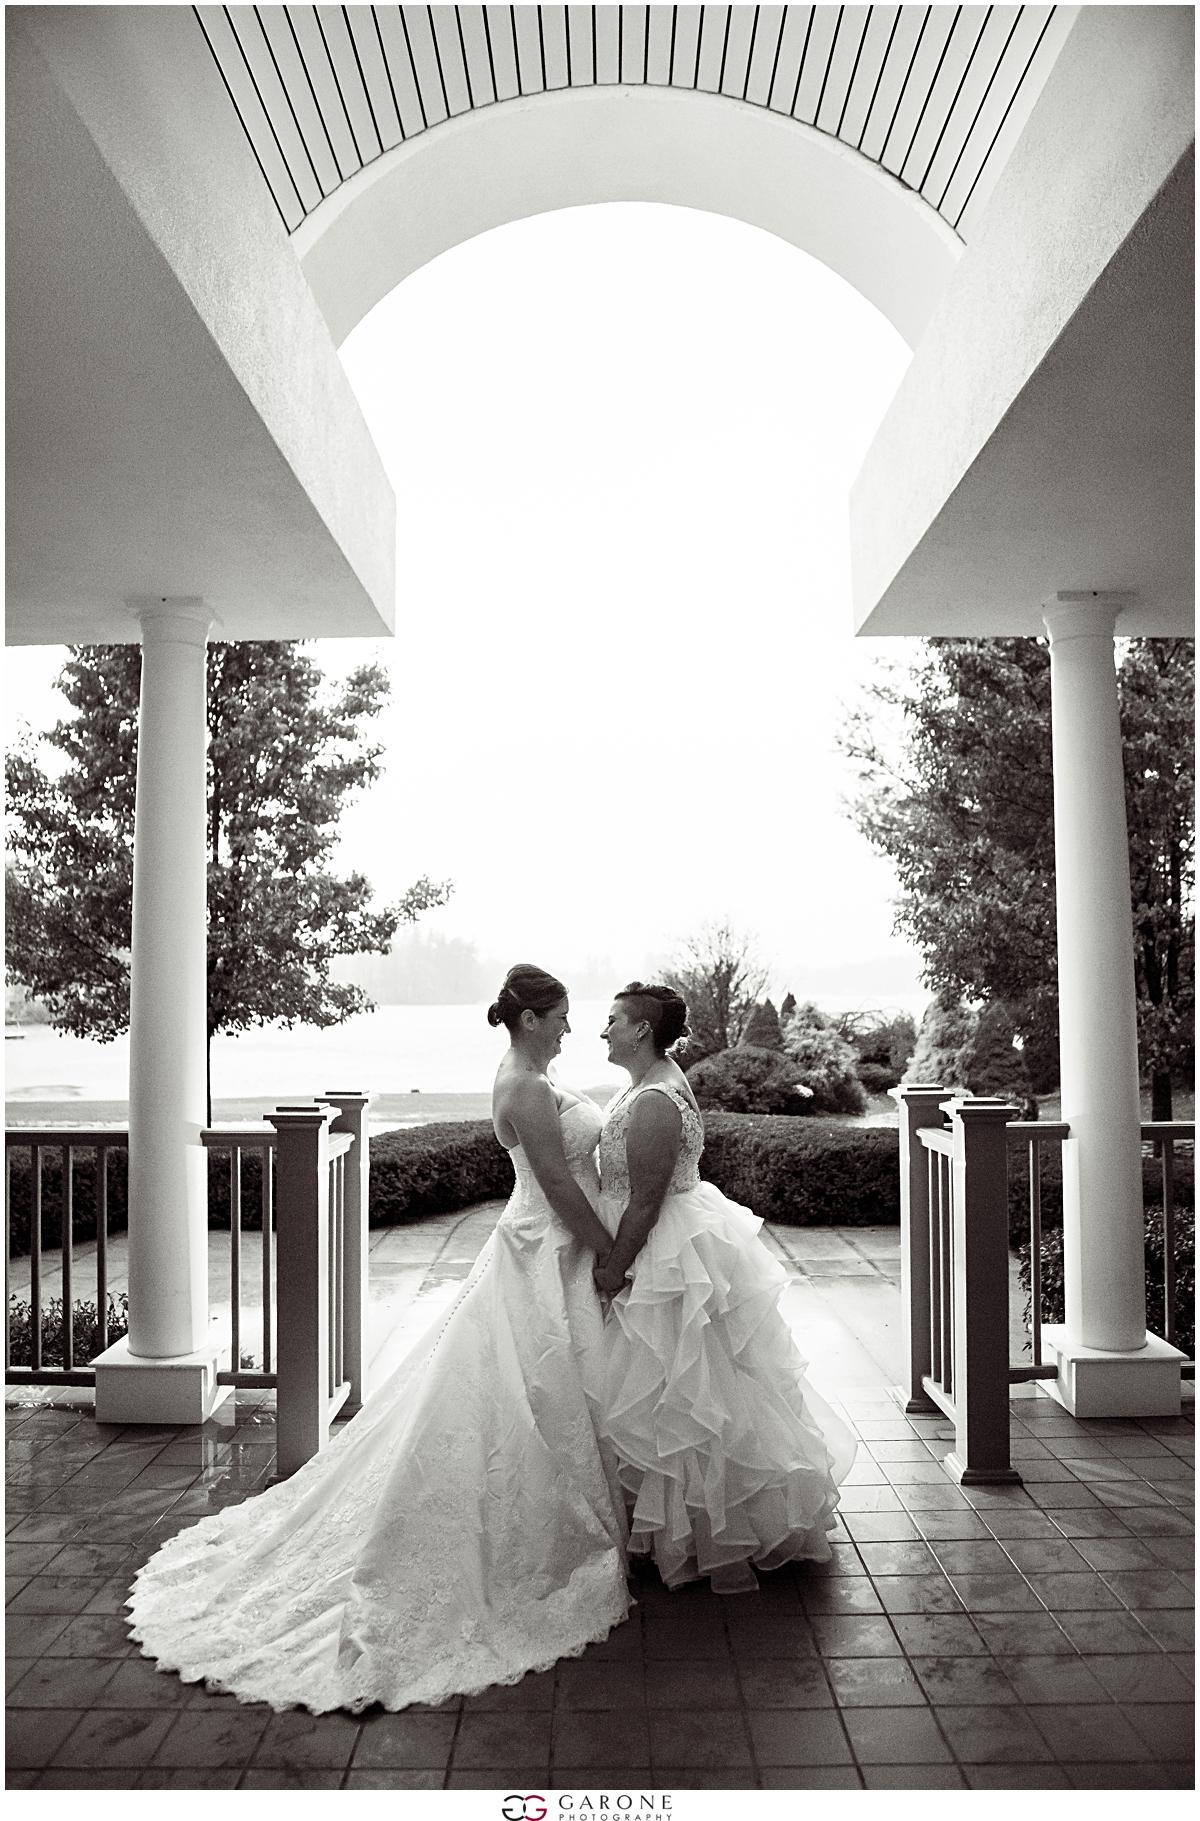 Jenna_Nicole_Castleton_Wedding_Love_is_love_NH_Wedding_Photographer_Garone_Photography_0031.jpg